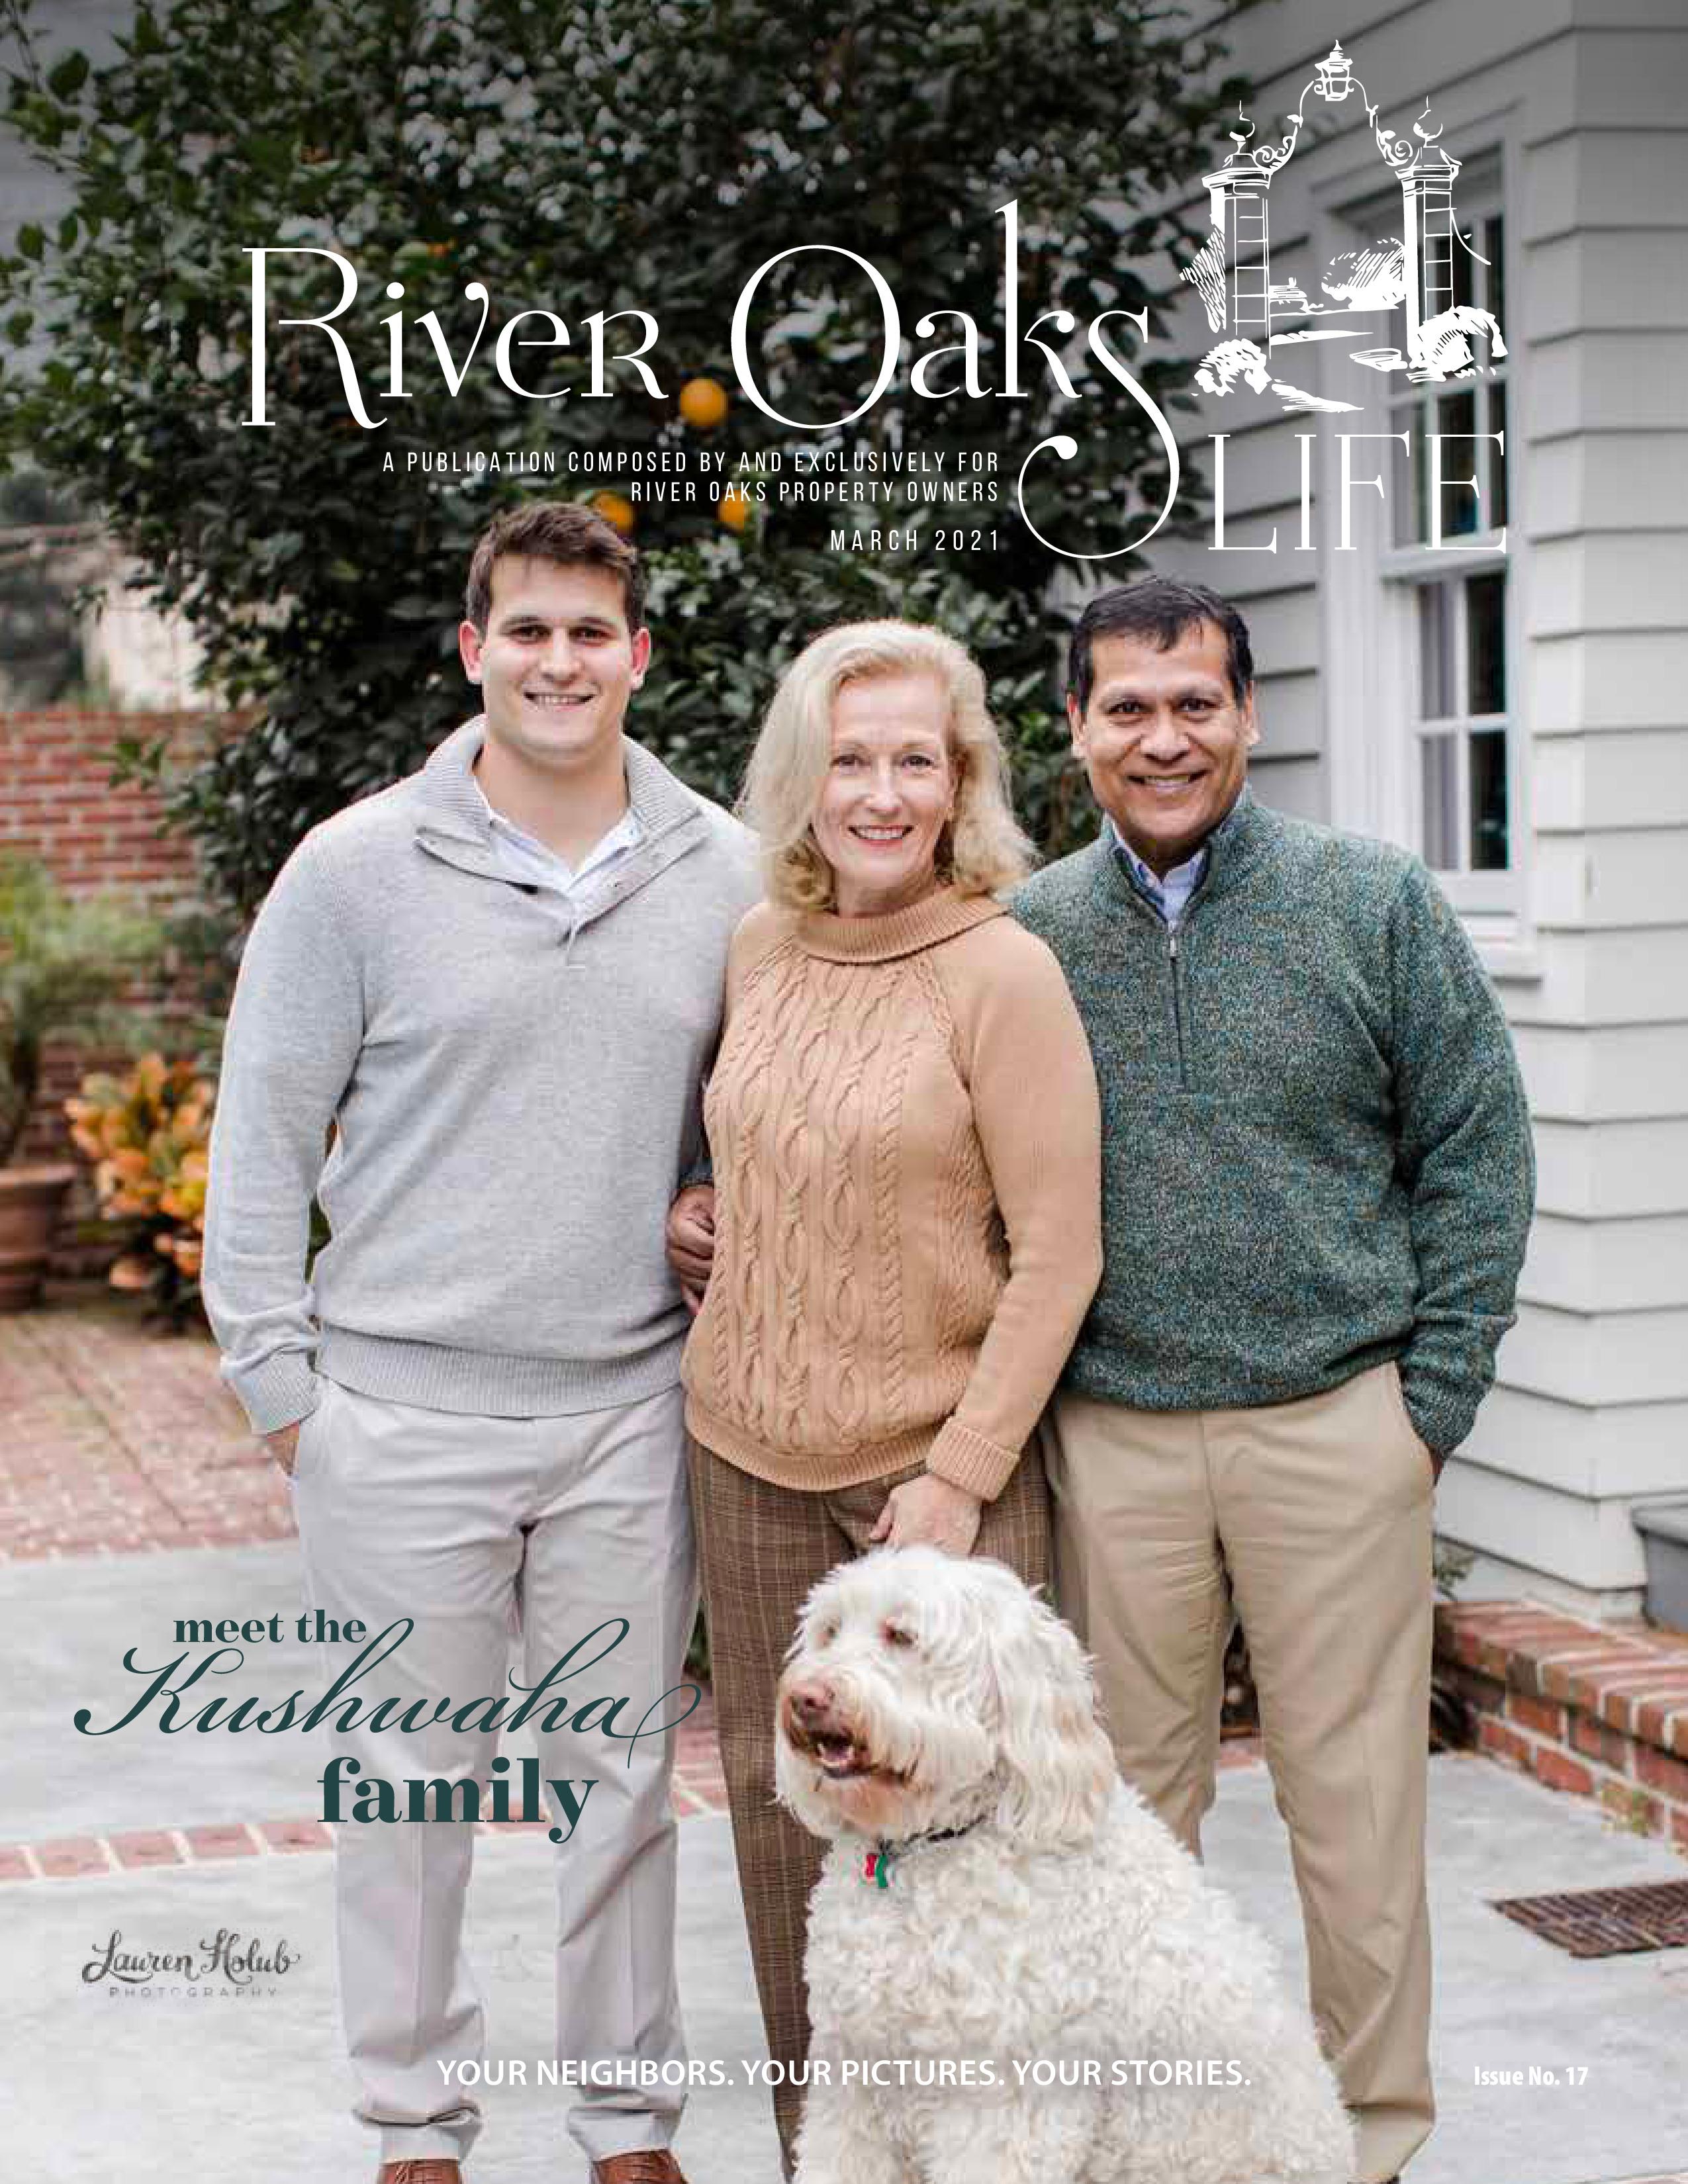 River Oaks Life 2021-03-01